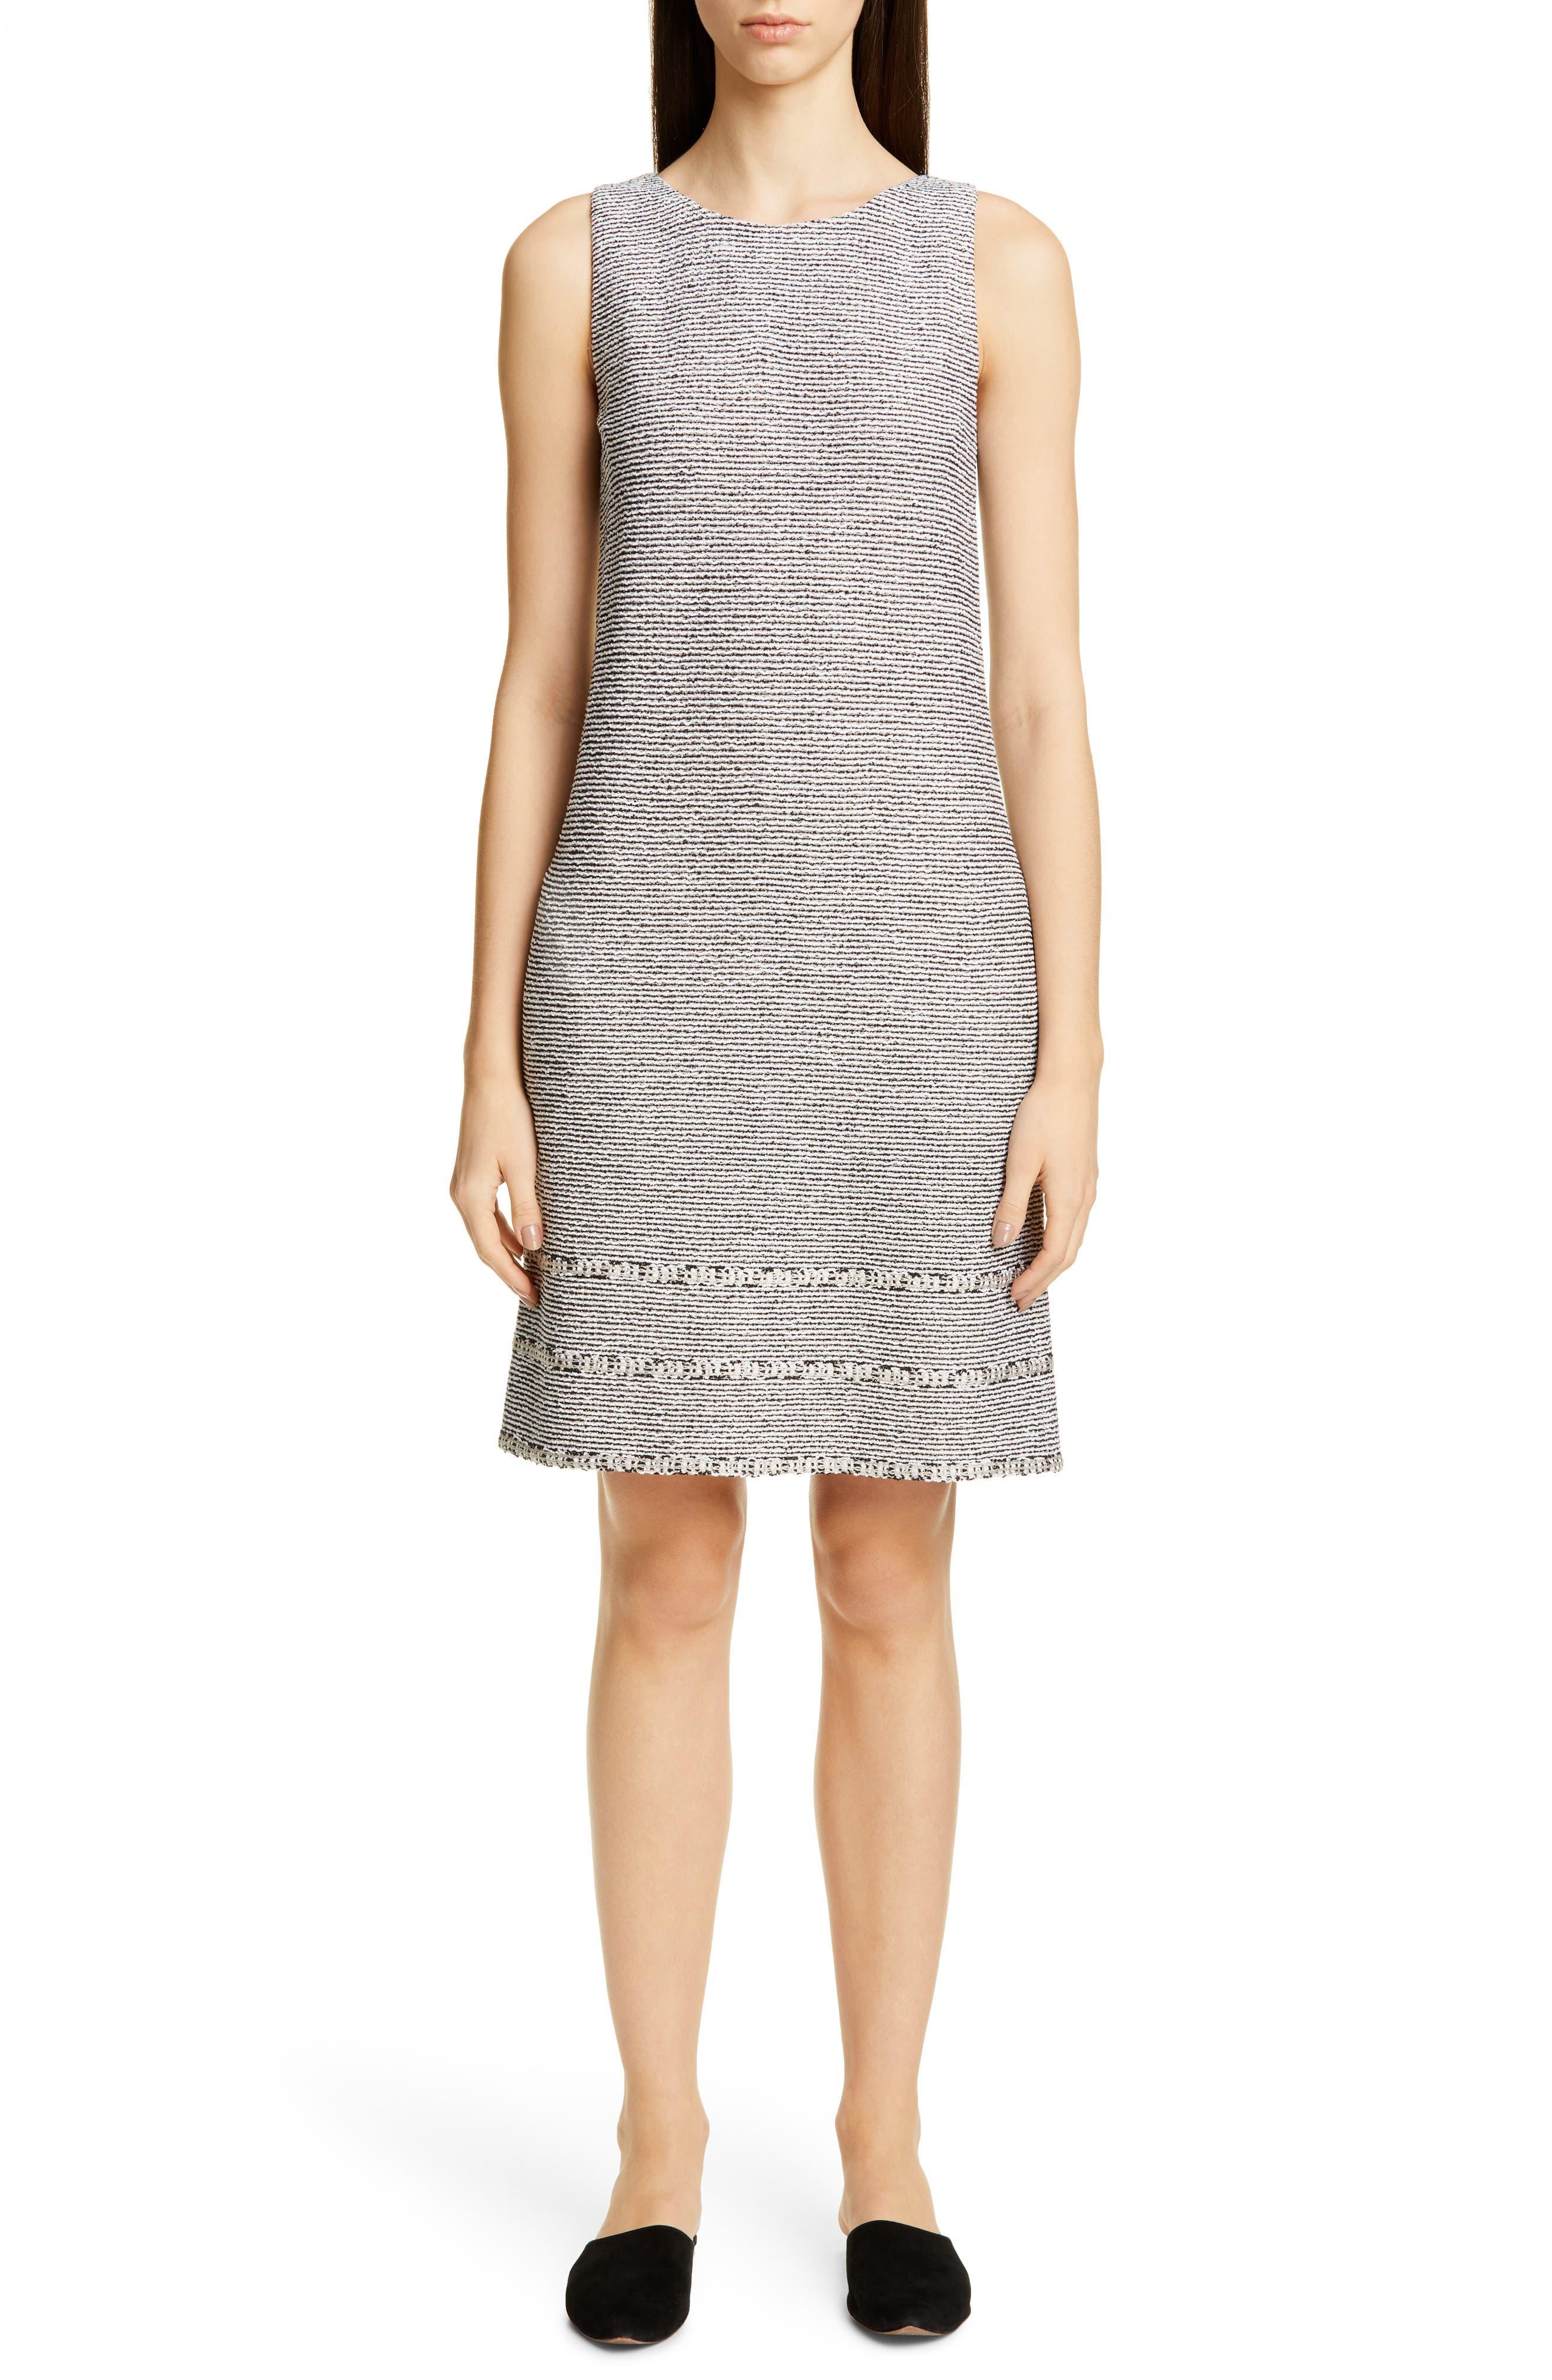 4b52aa812 Cheap Formal Dresses For Juniors Under 100